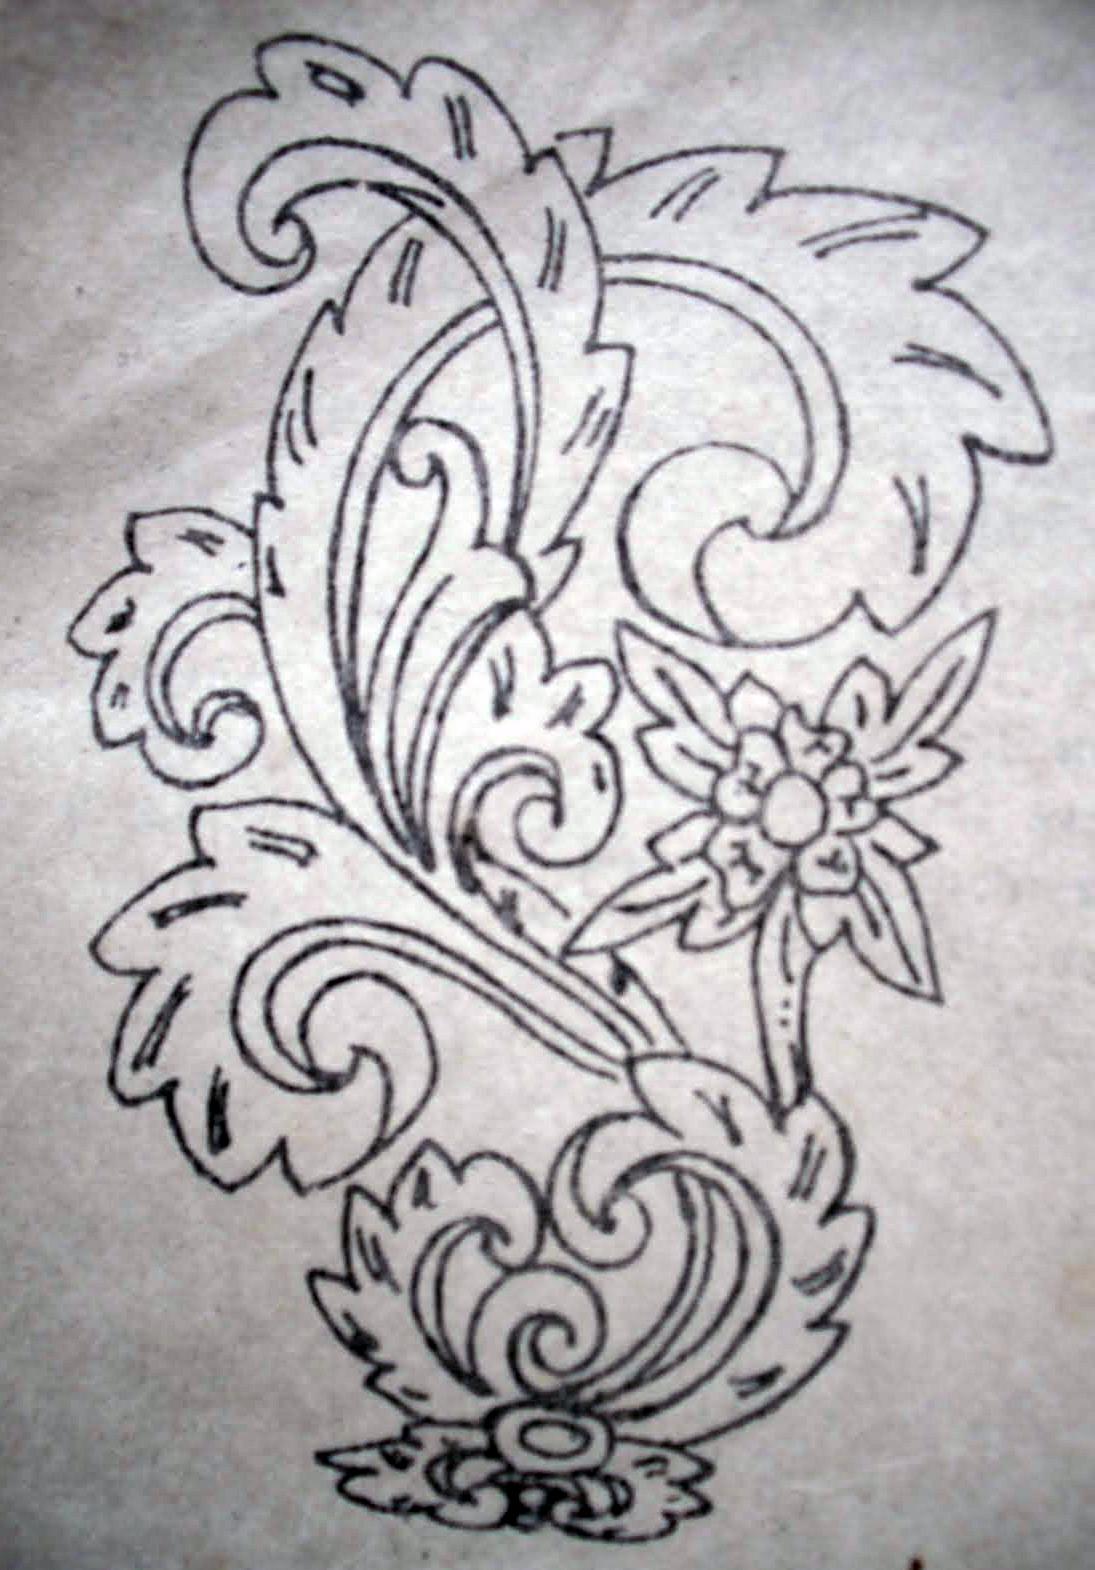 Contoh Gambar Ornamen : contoh, gambar, ornamen, Popular, Ornamen, Nusantara, Mudah, Tasya